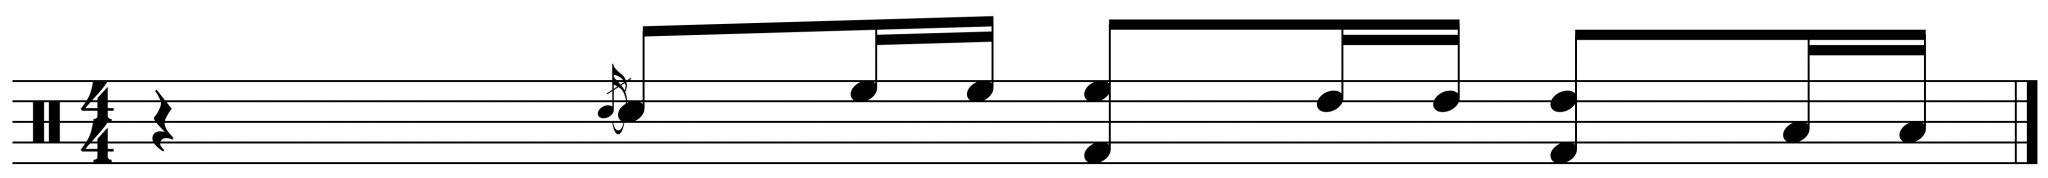 adding the bass drum